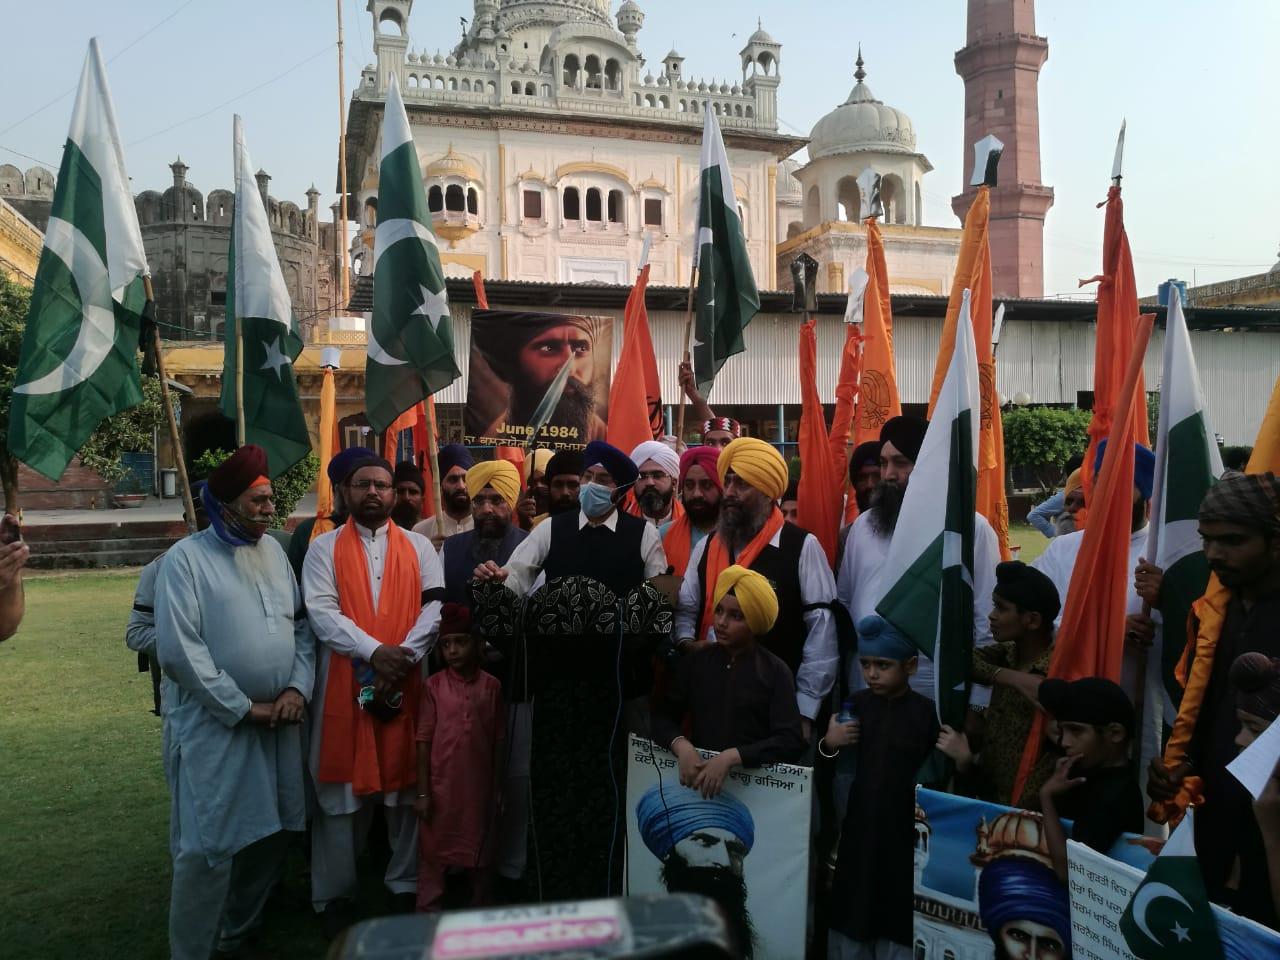 Sikh community of Pakistan arranged protest